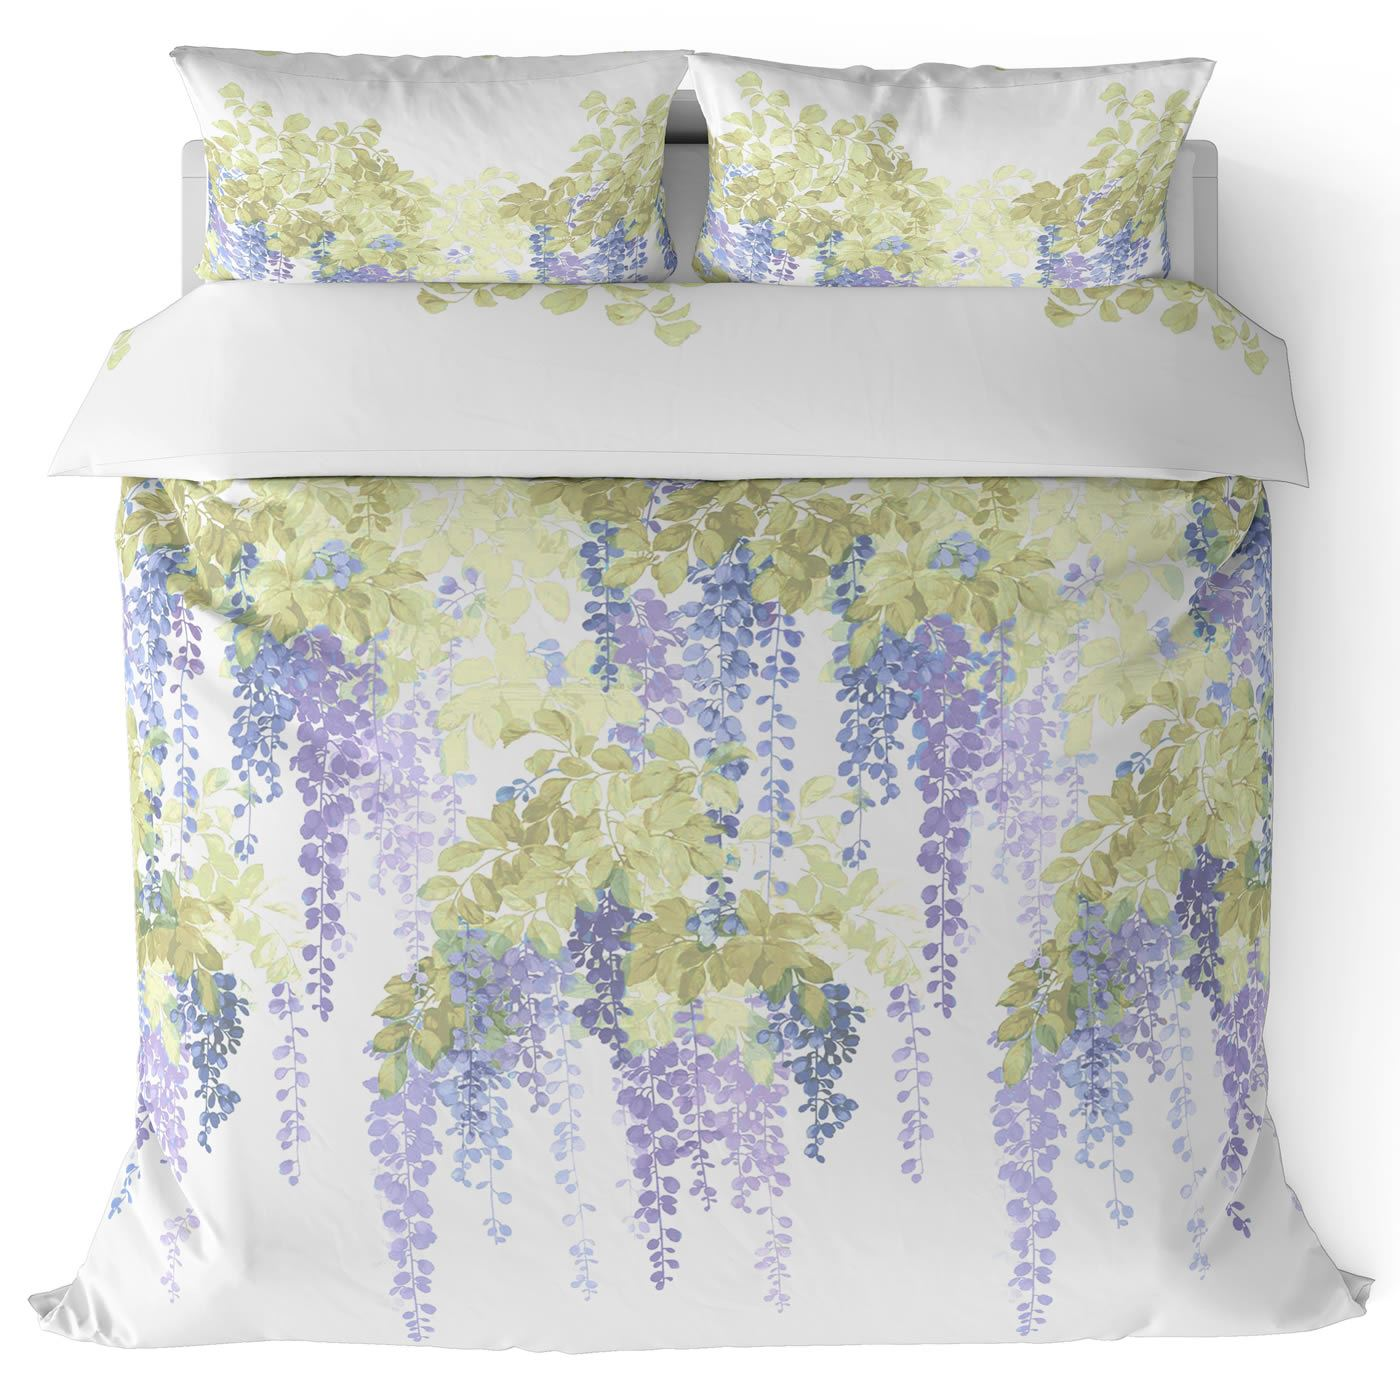 Funda-nordica-azul-azul-marino-verde-azulado-edredon-algodon-estampado-juego-conjuntos-de-cama-cubre miniatura 25